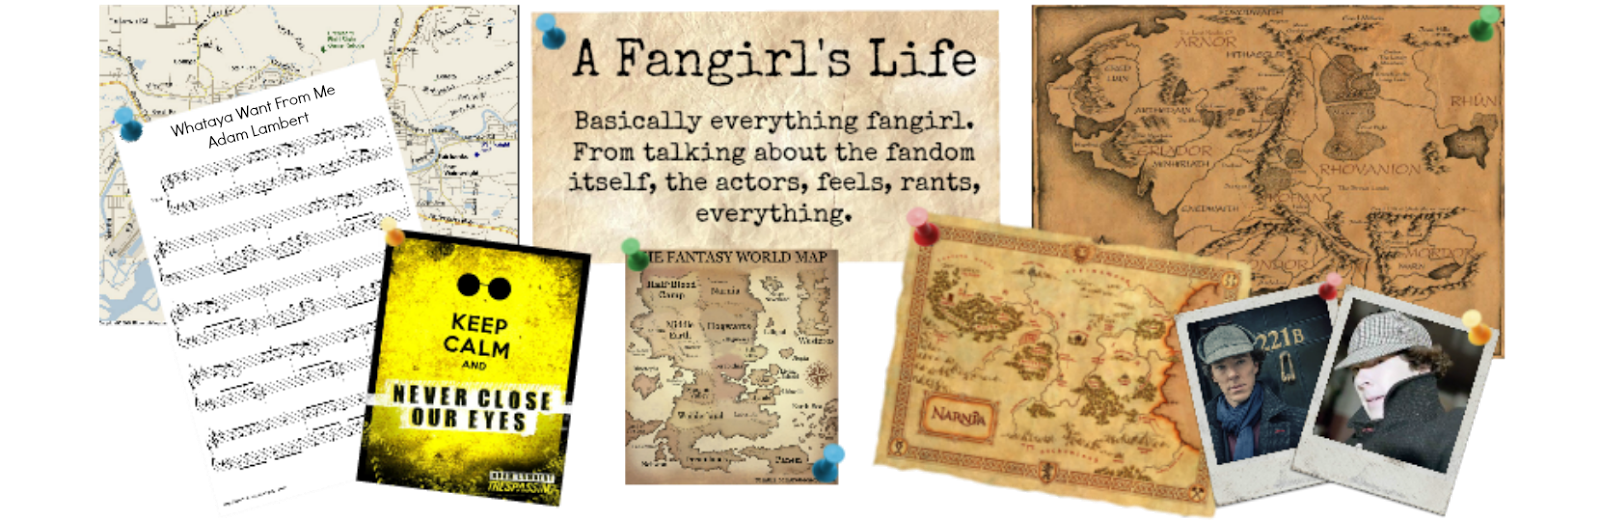 A Fangirls Life